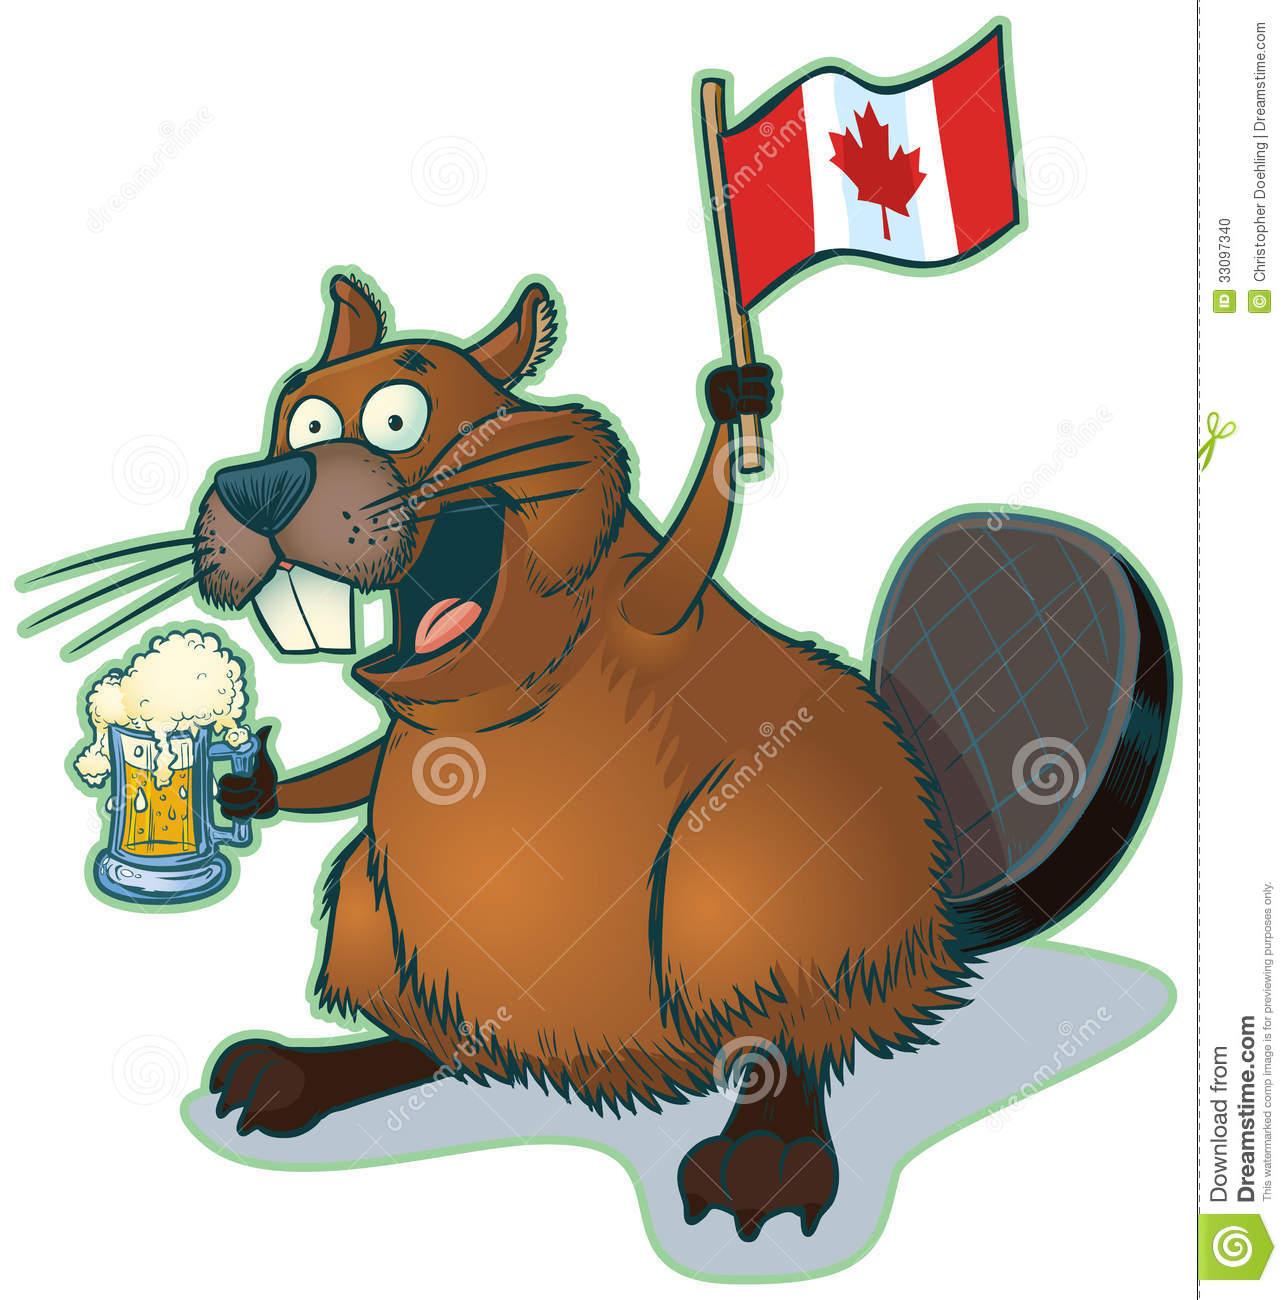 Like, Happy Canada Day, eh?